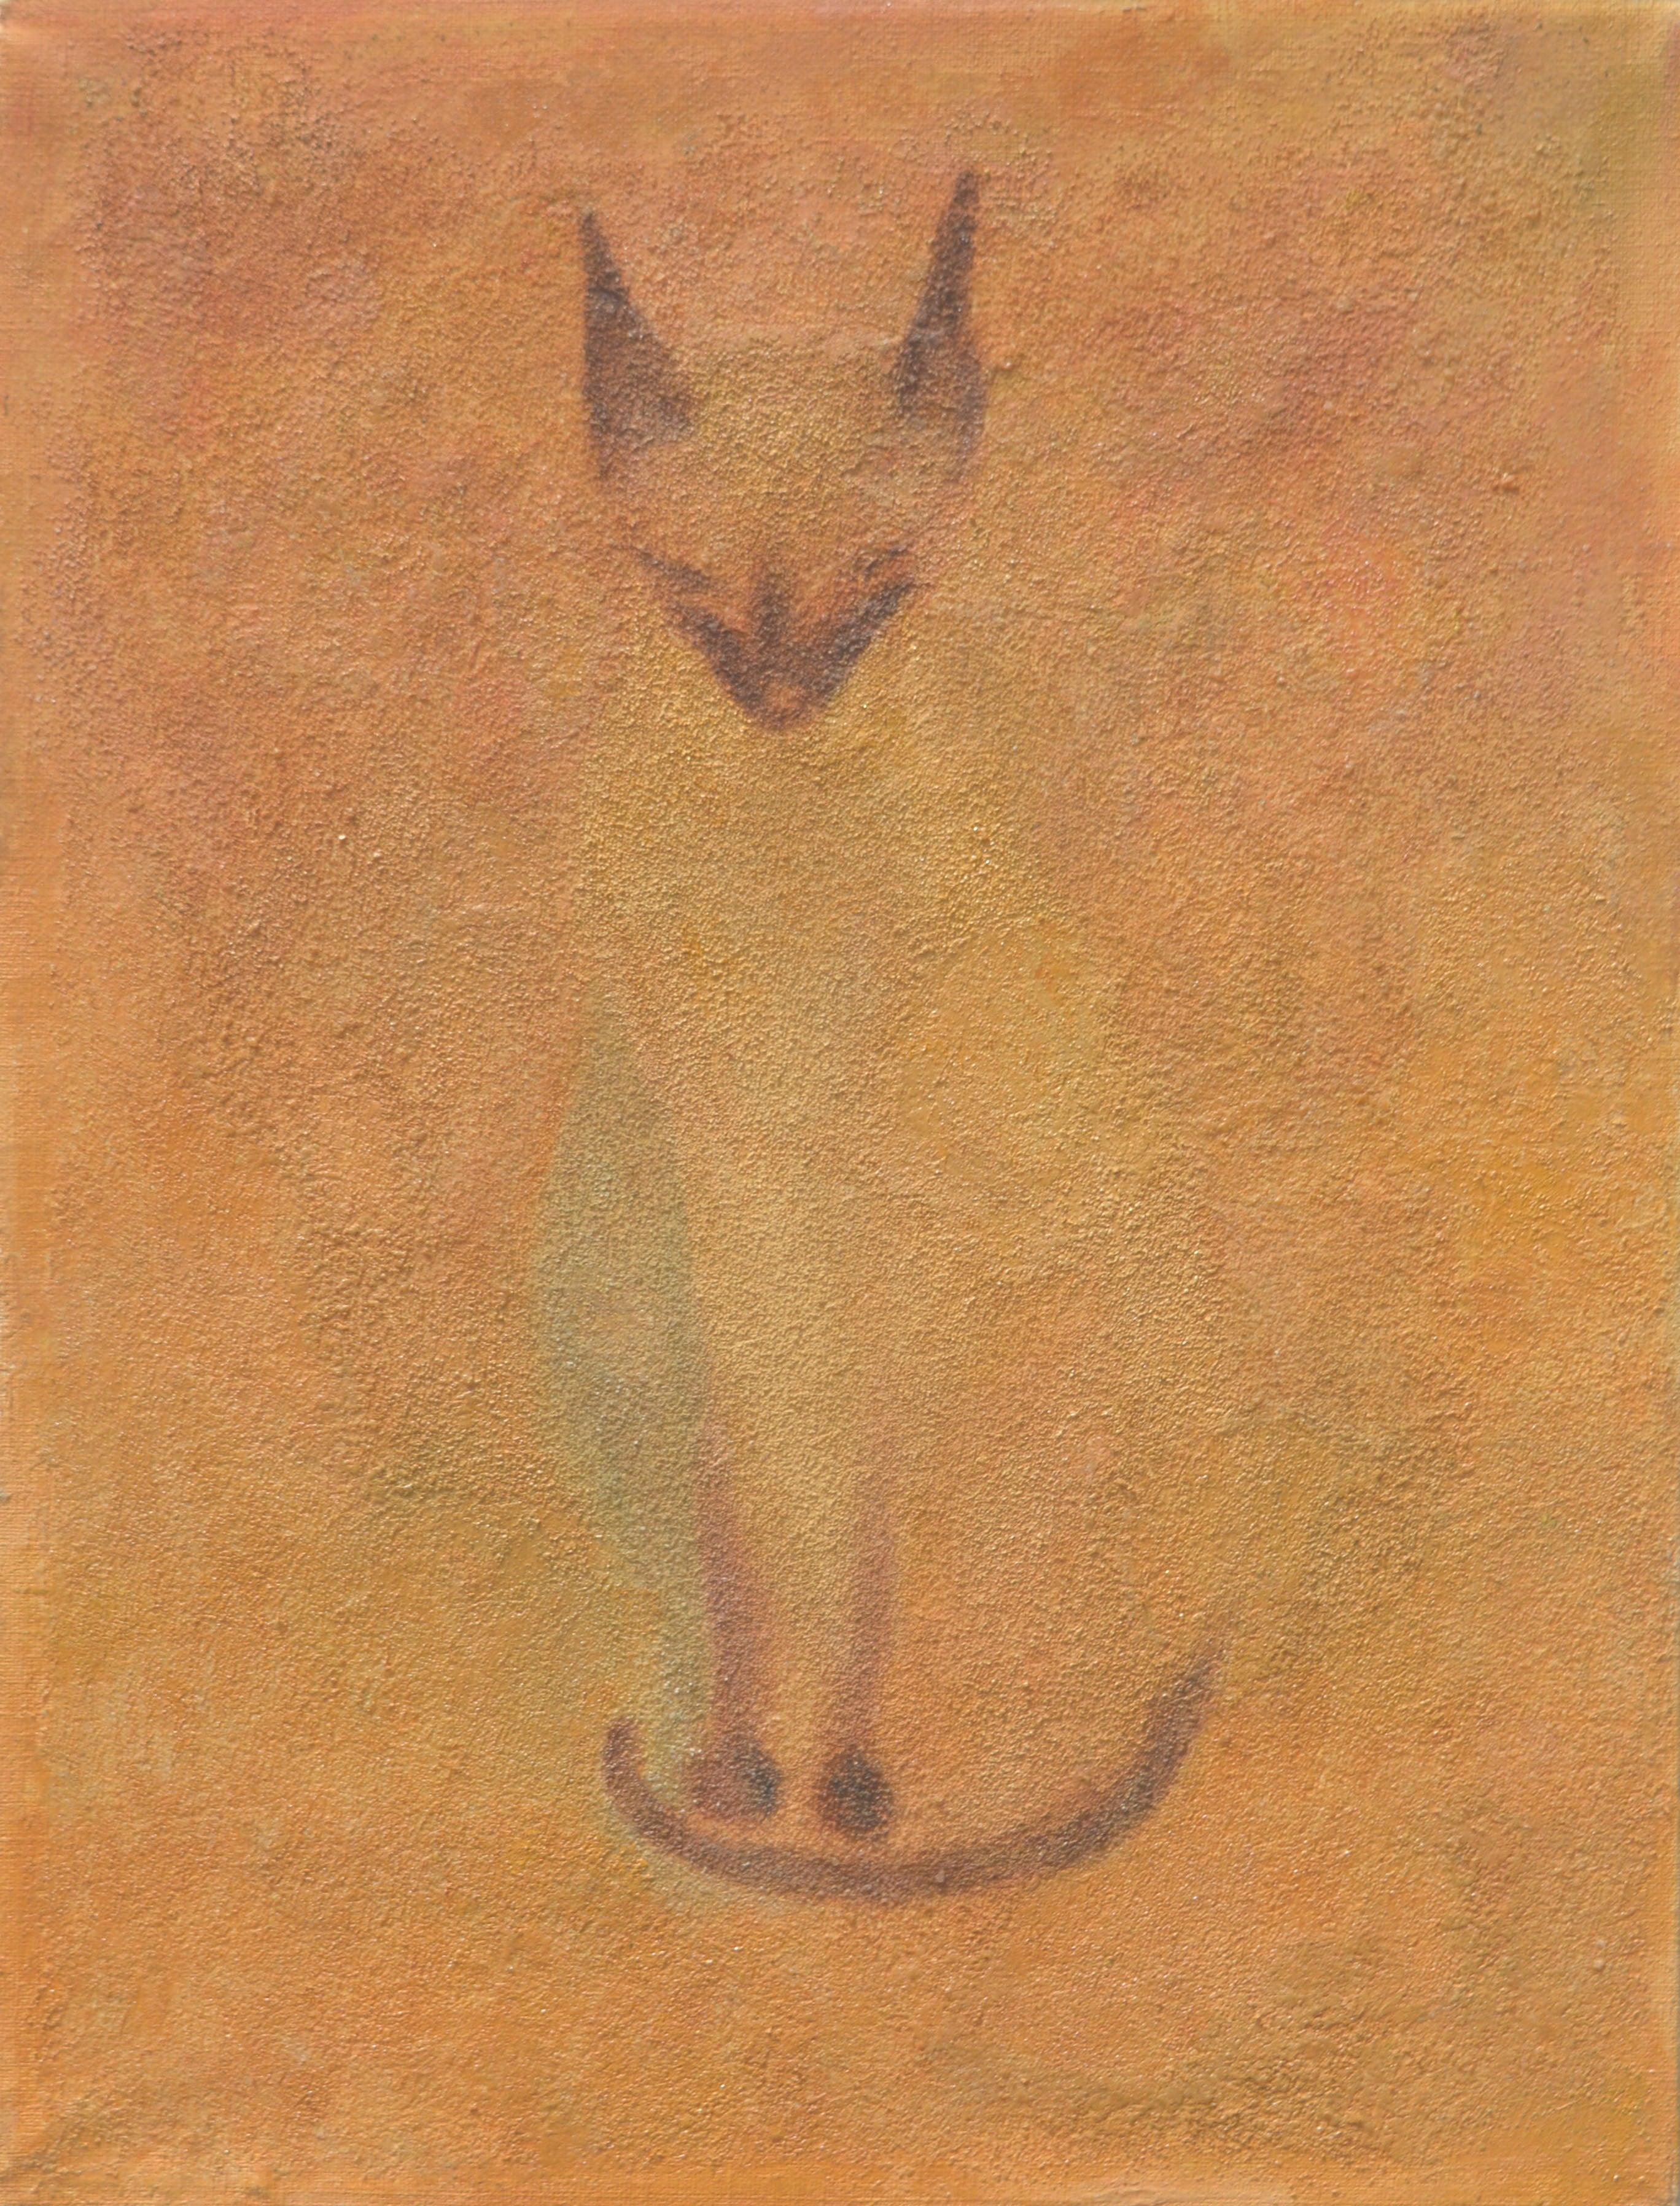 Mid Century Modernist Siamese Cat, 1953